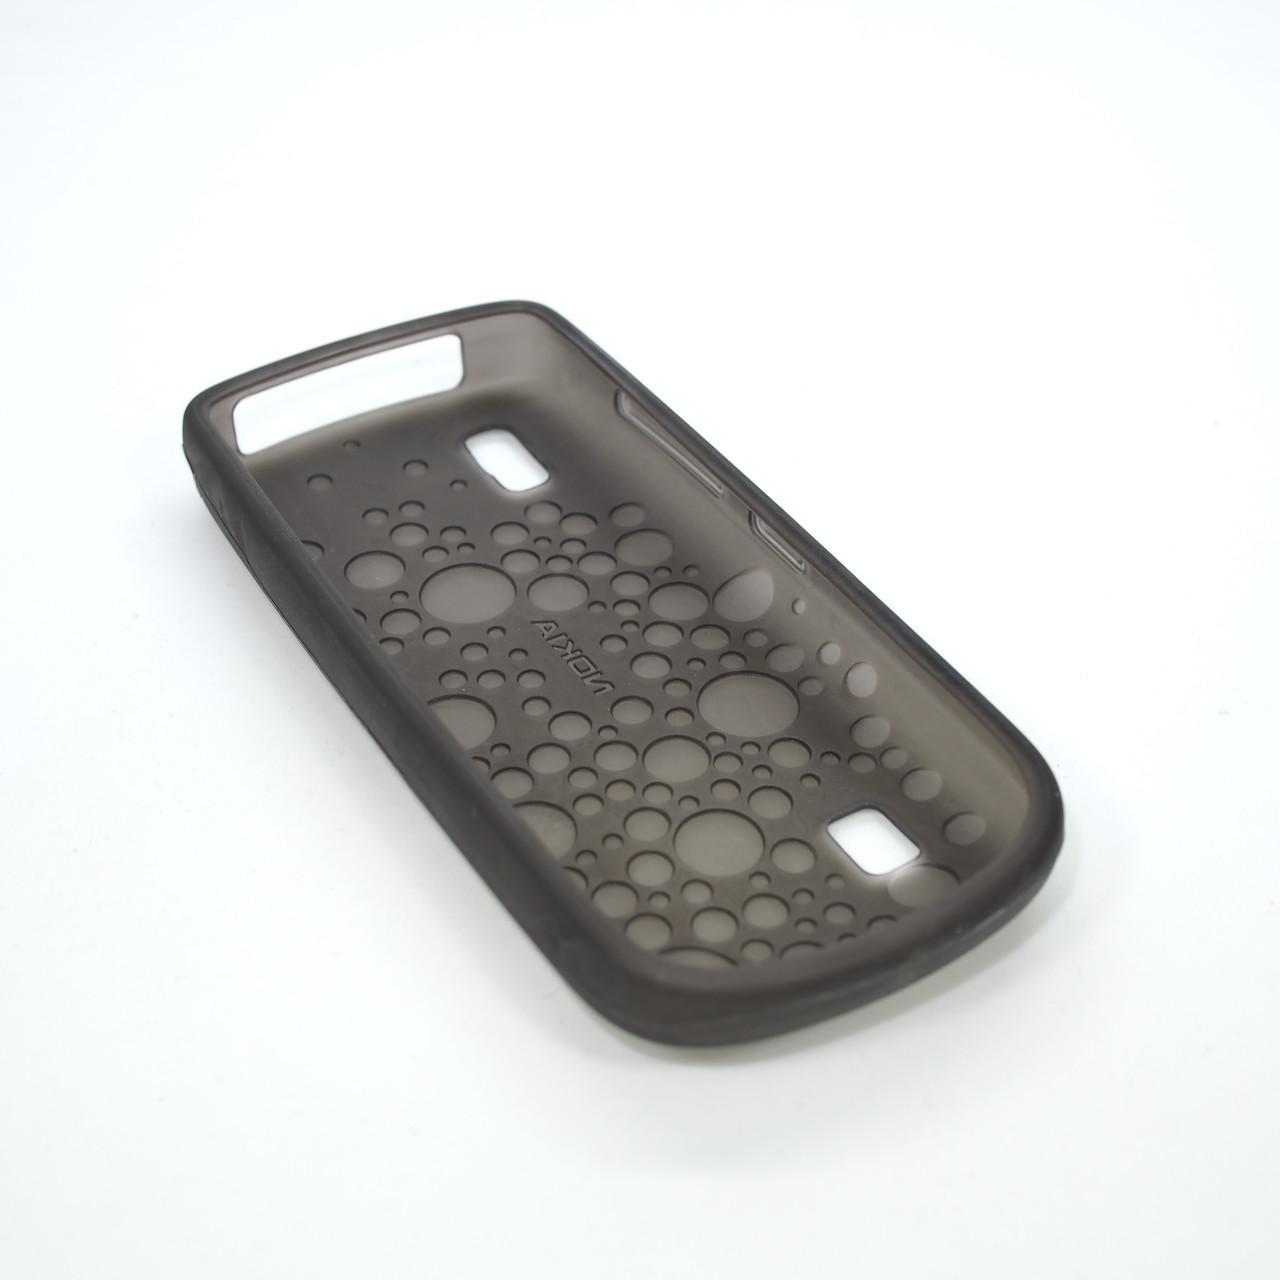 Чехол Nokia CC-1035 300 Silicone Cover black Для телефона